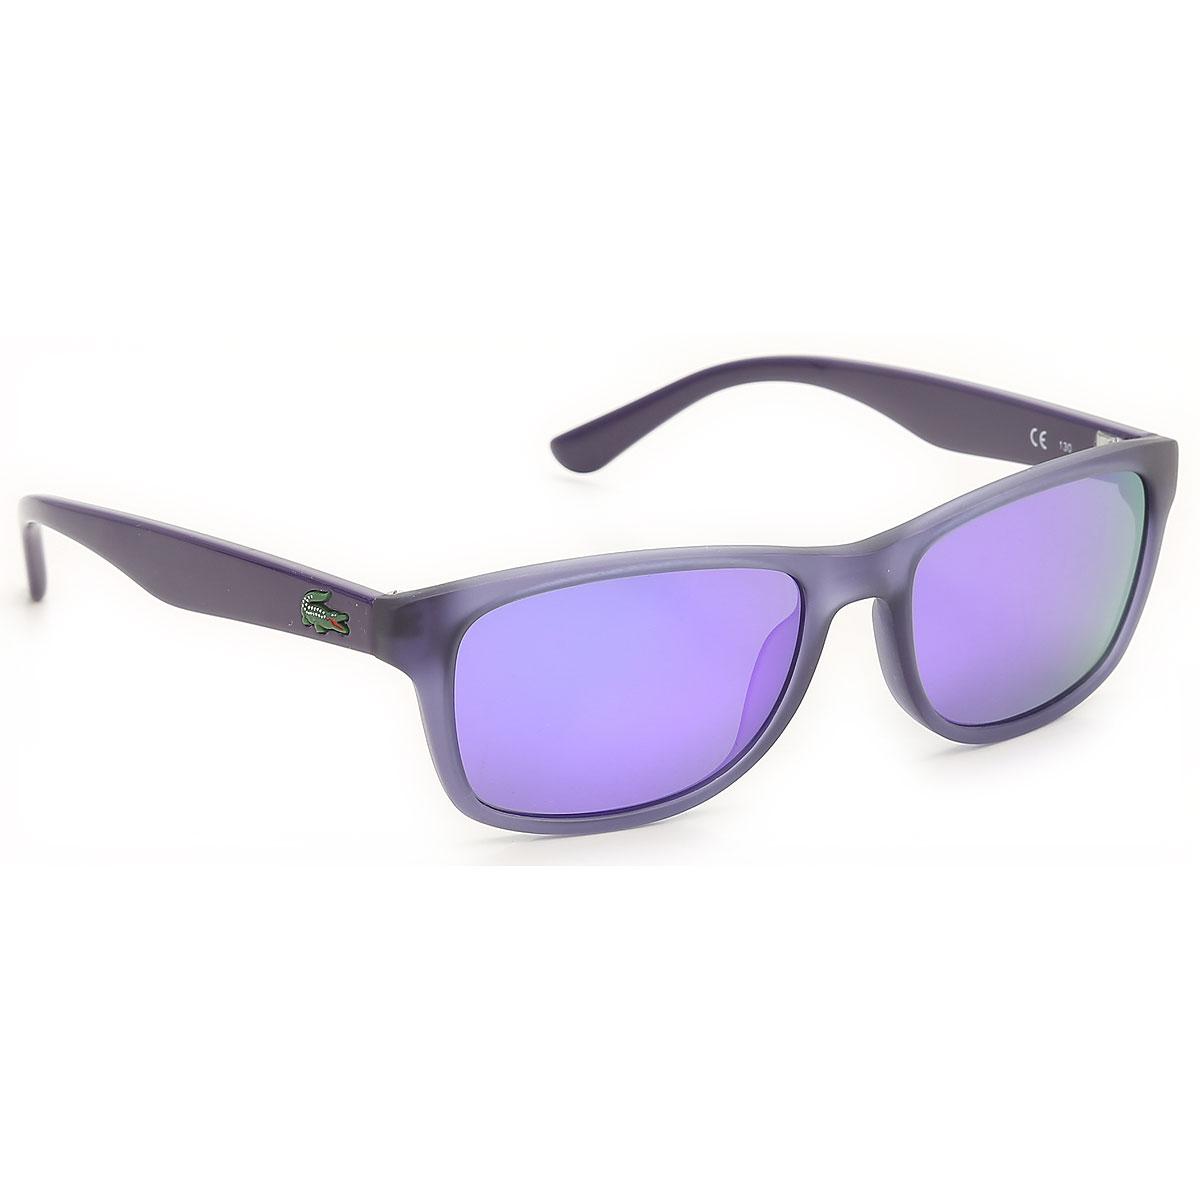 Image of Lacoste Kids Sunglasses for Girls On Sale, Matt Transparent Violet, 2017